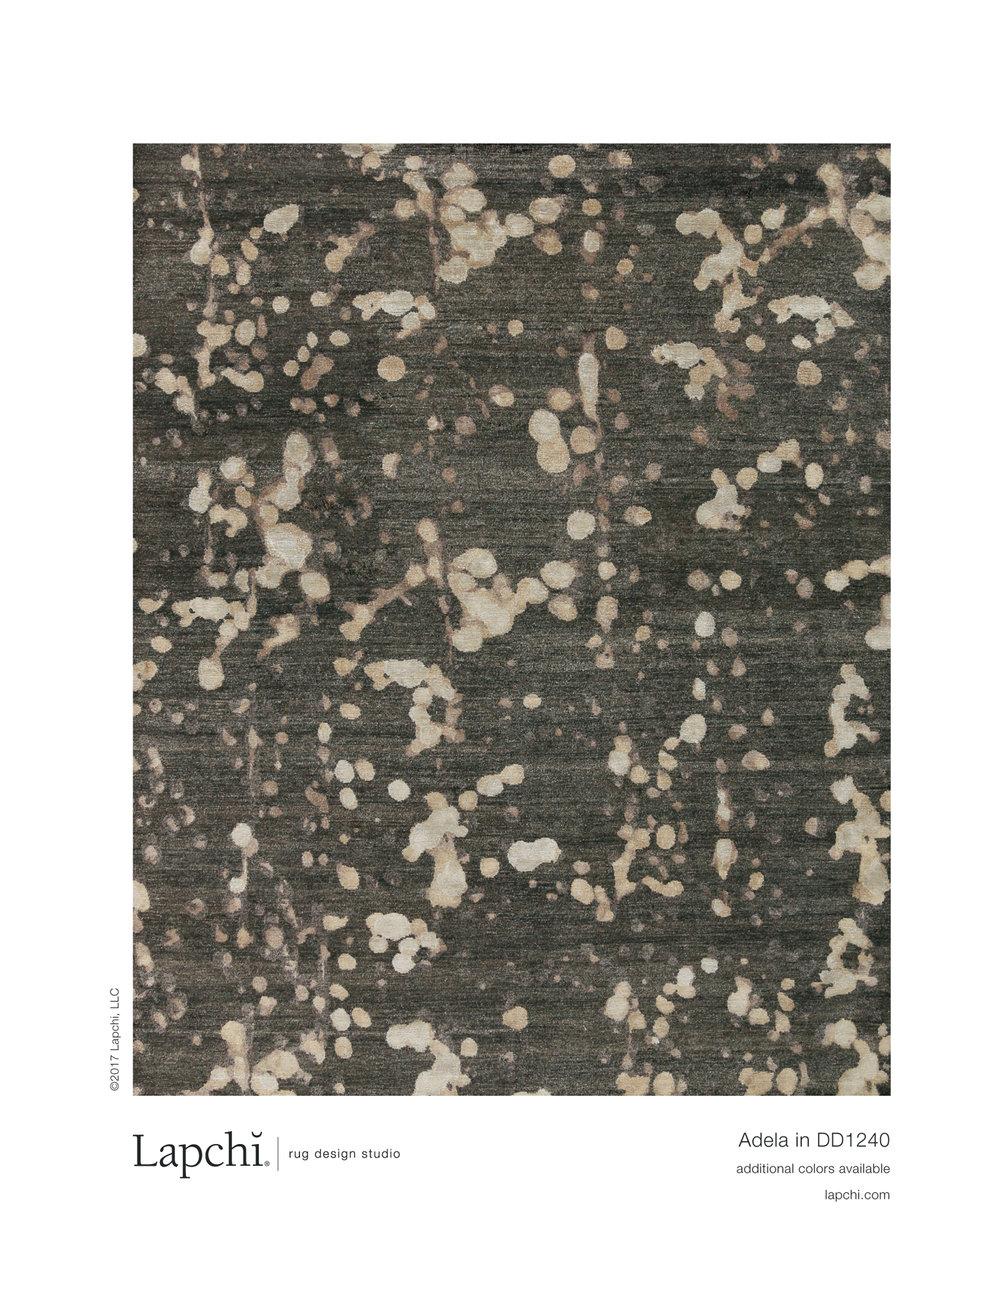 Adela area rug from Lapchi rug design studio.